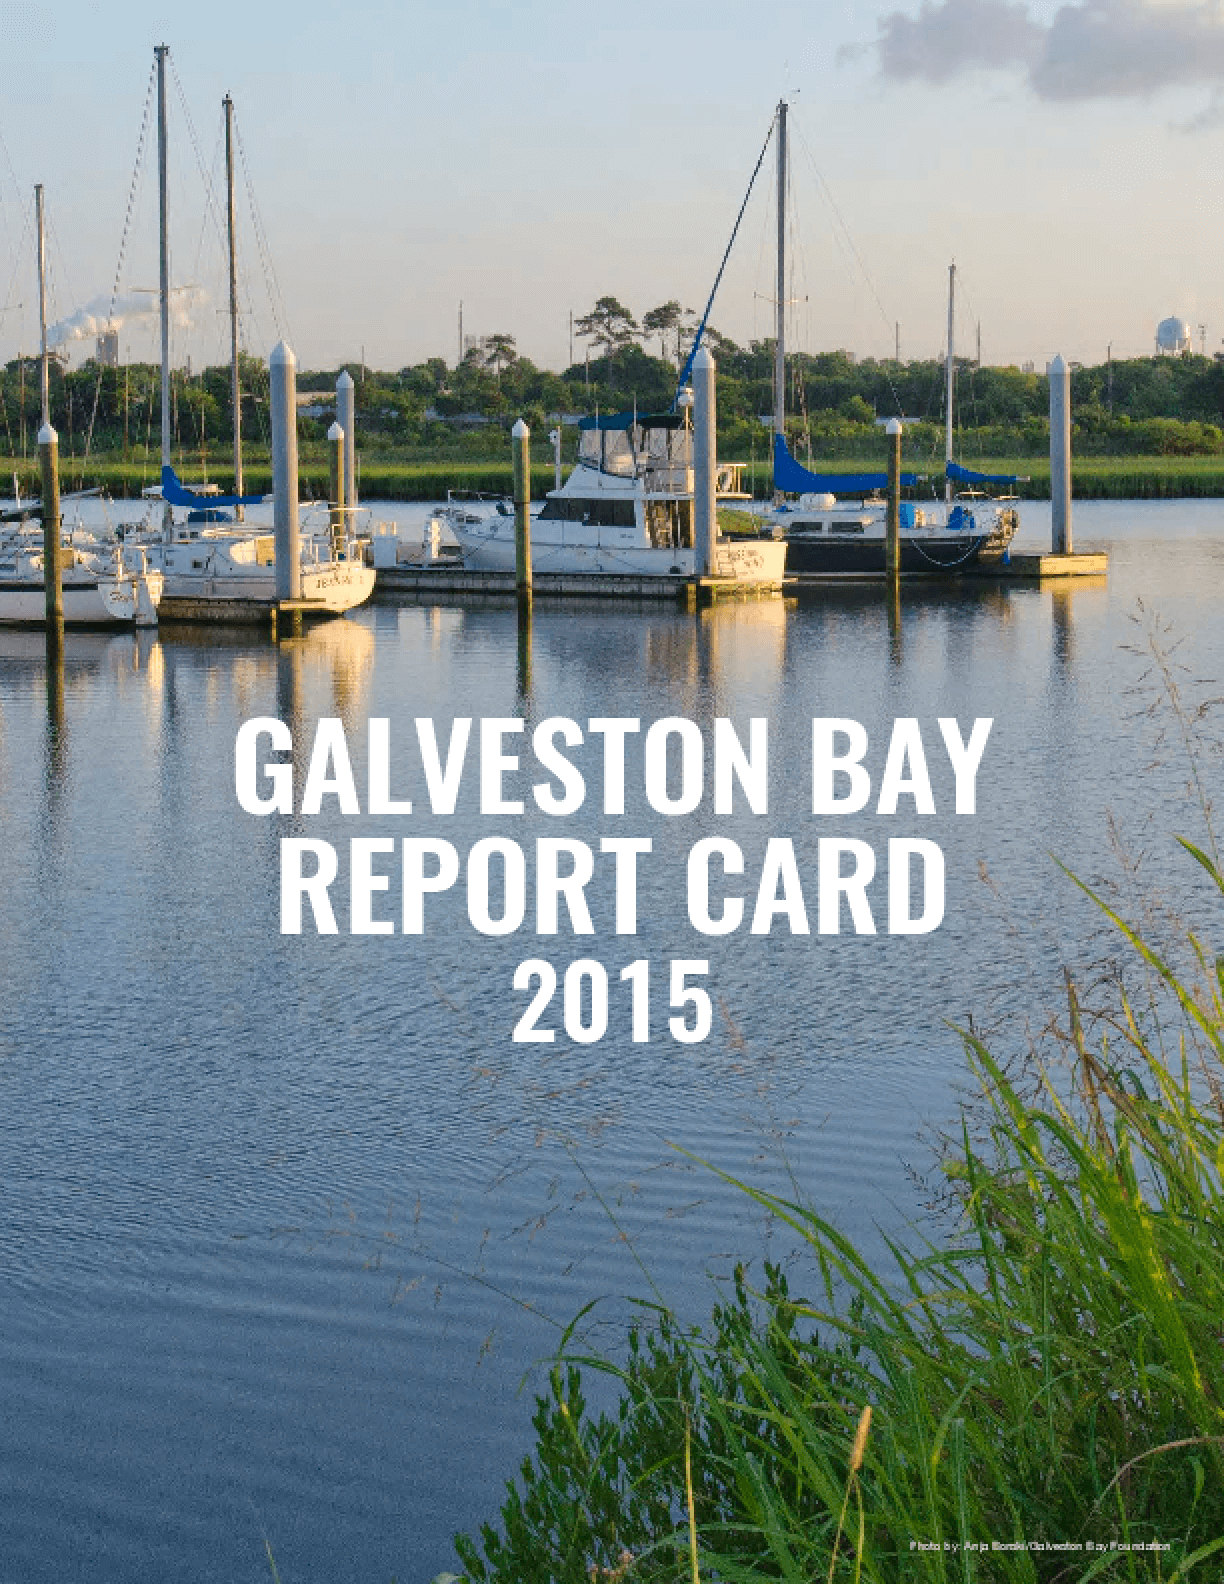 Galveston Bay Report Card 2015